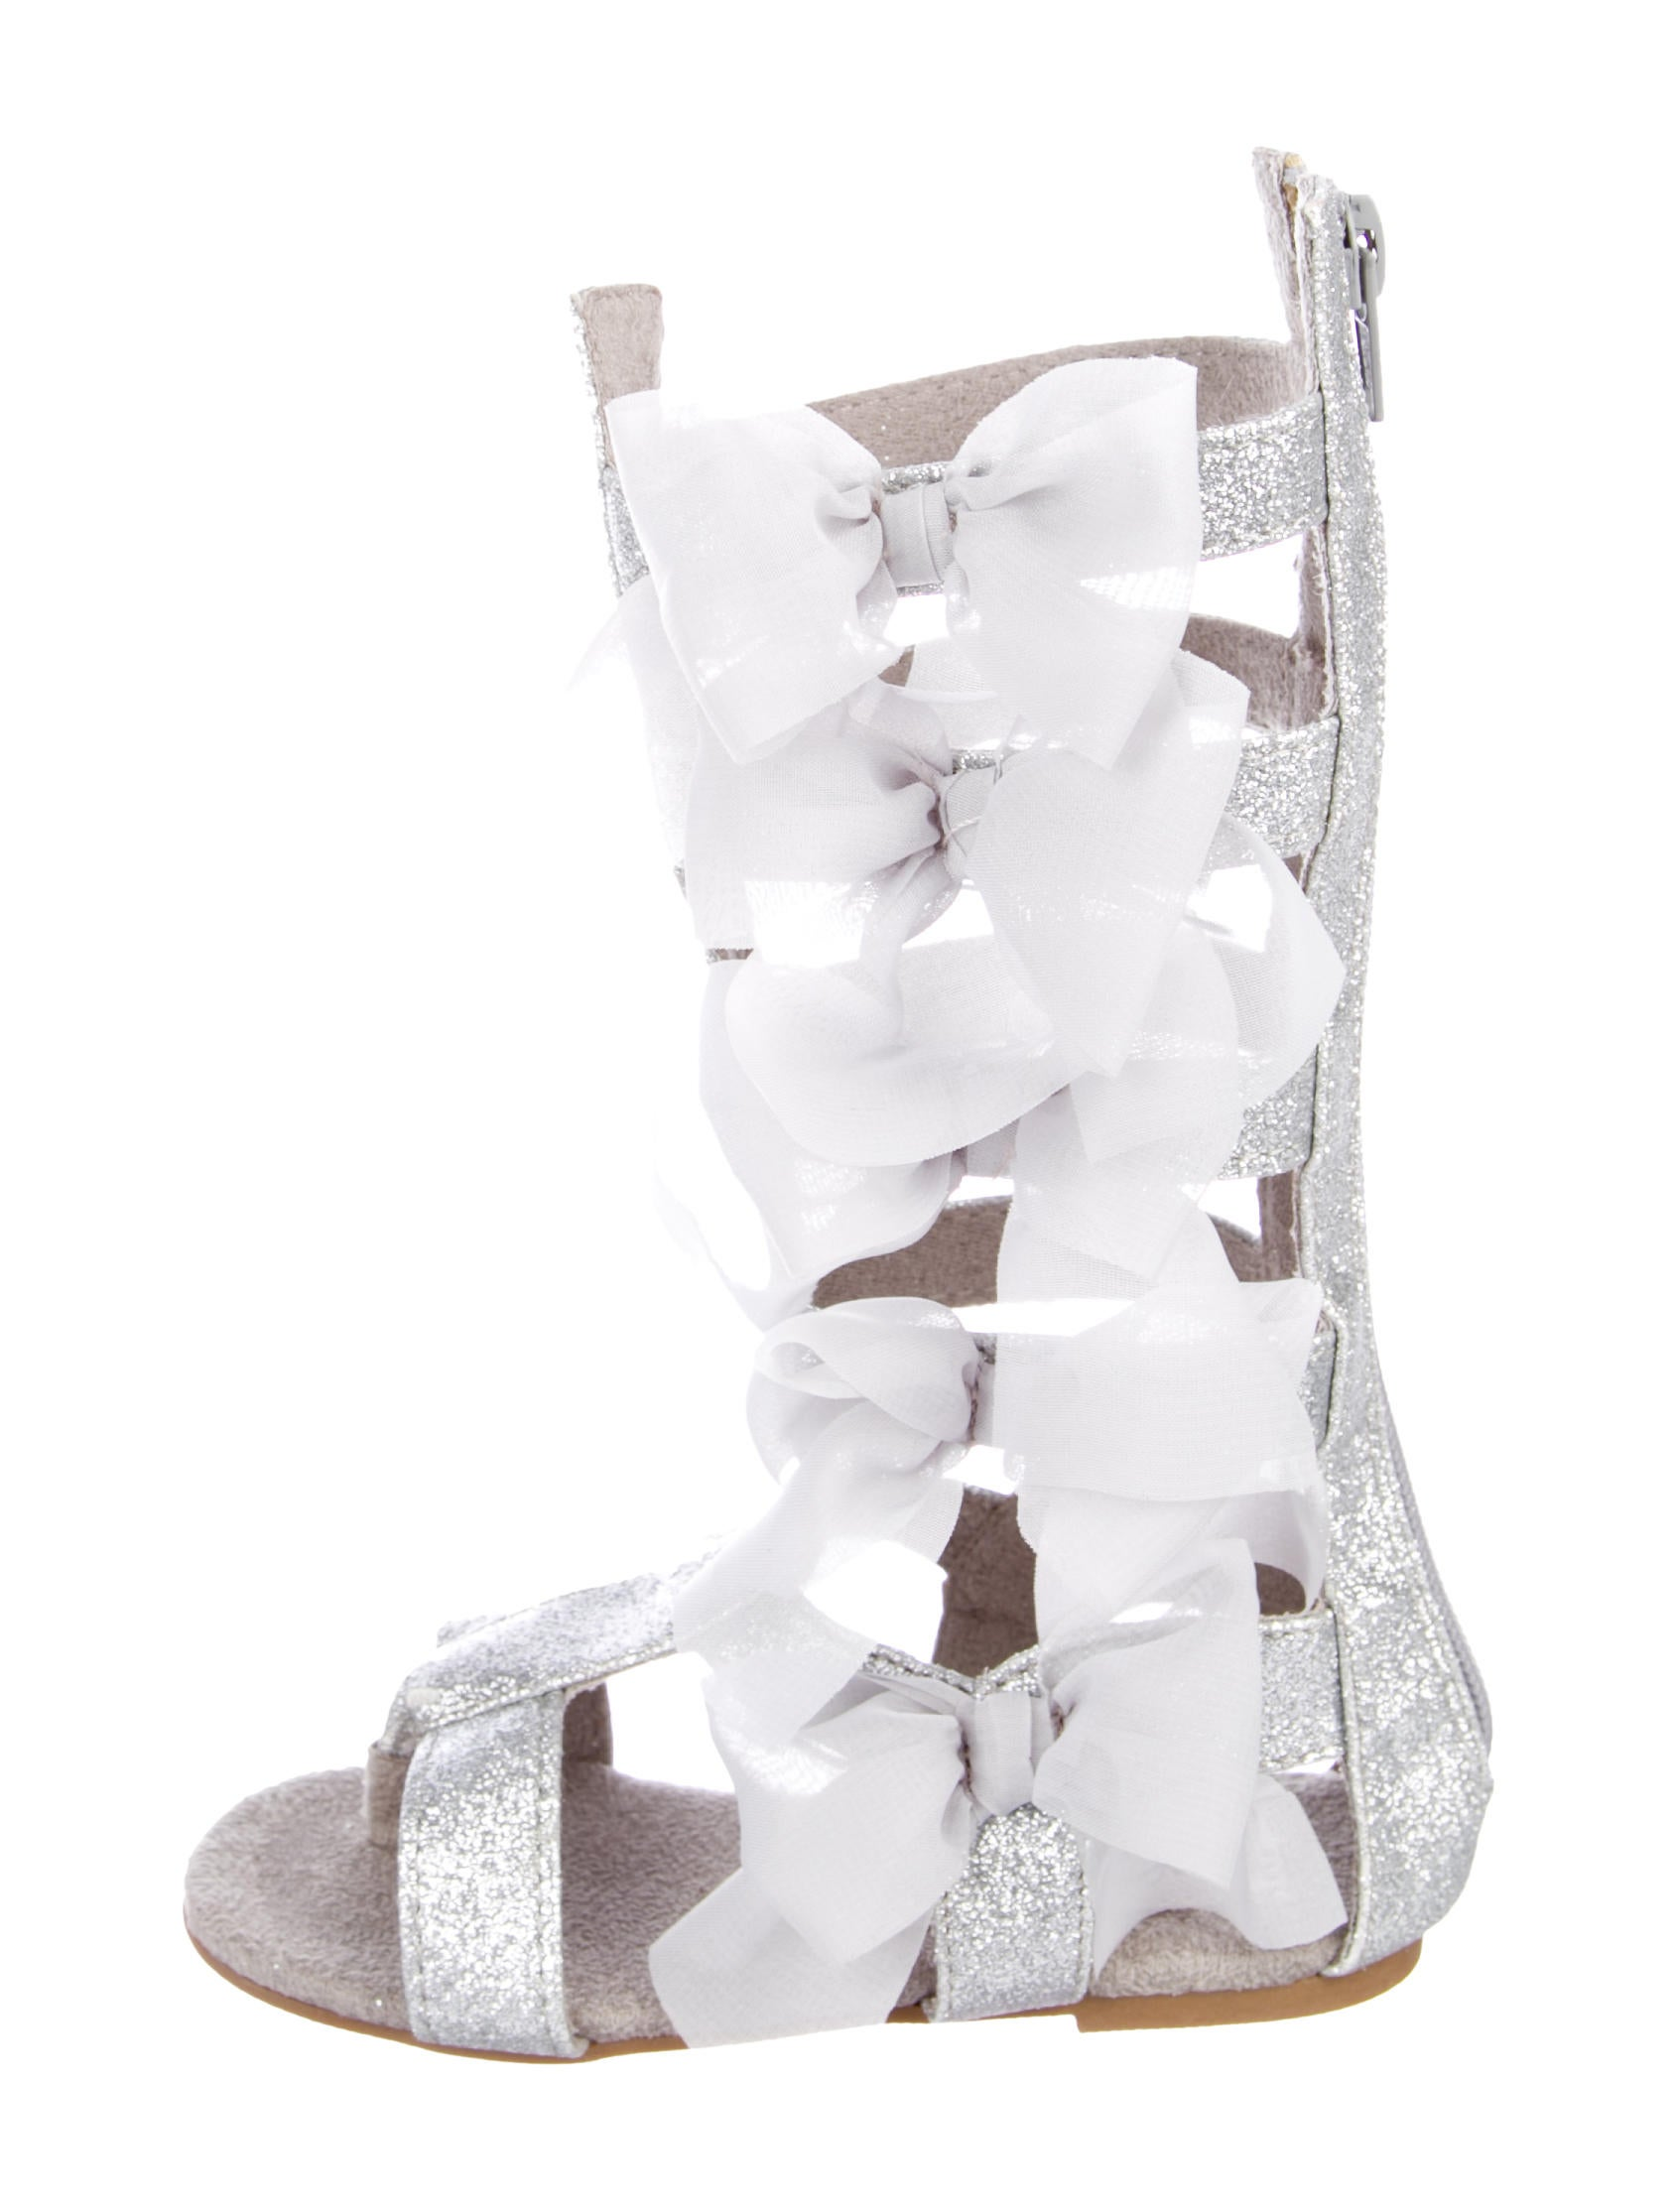 67787bbc44a7 Joyfolie girls metallic gladiator sandals girls wjfol jpg 1689x2229 Joyfolie  gladiator sandals